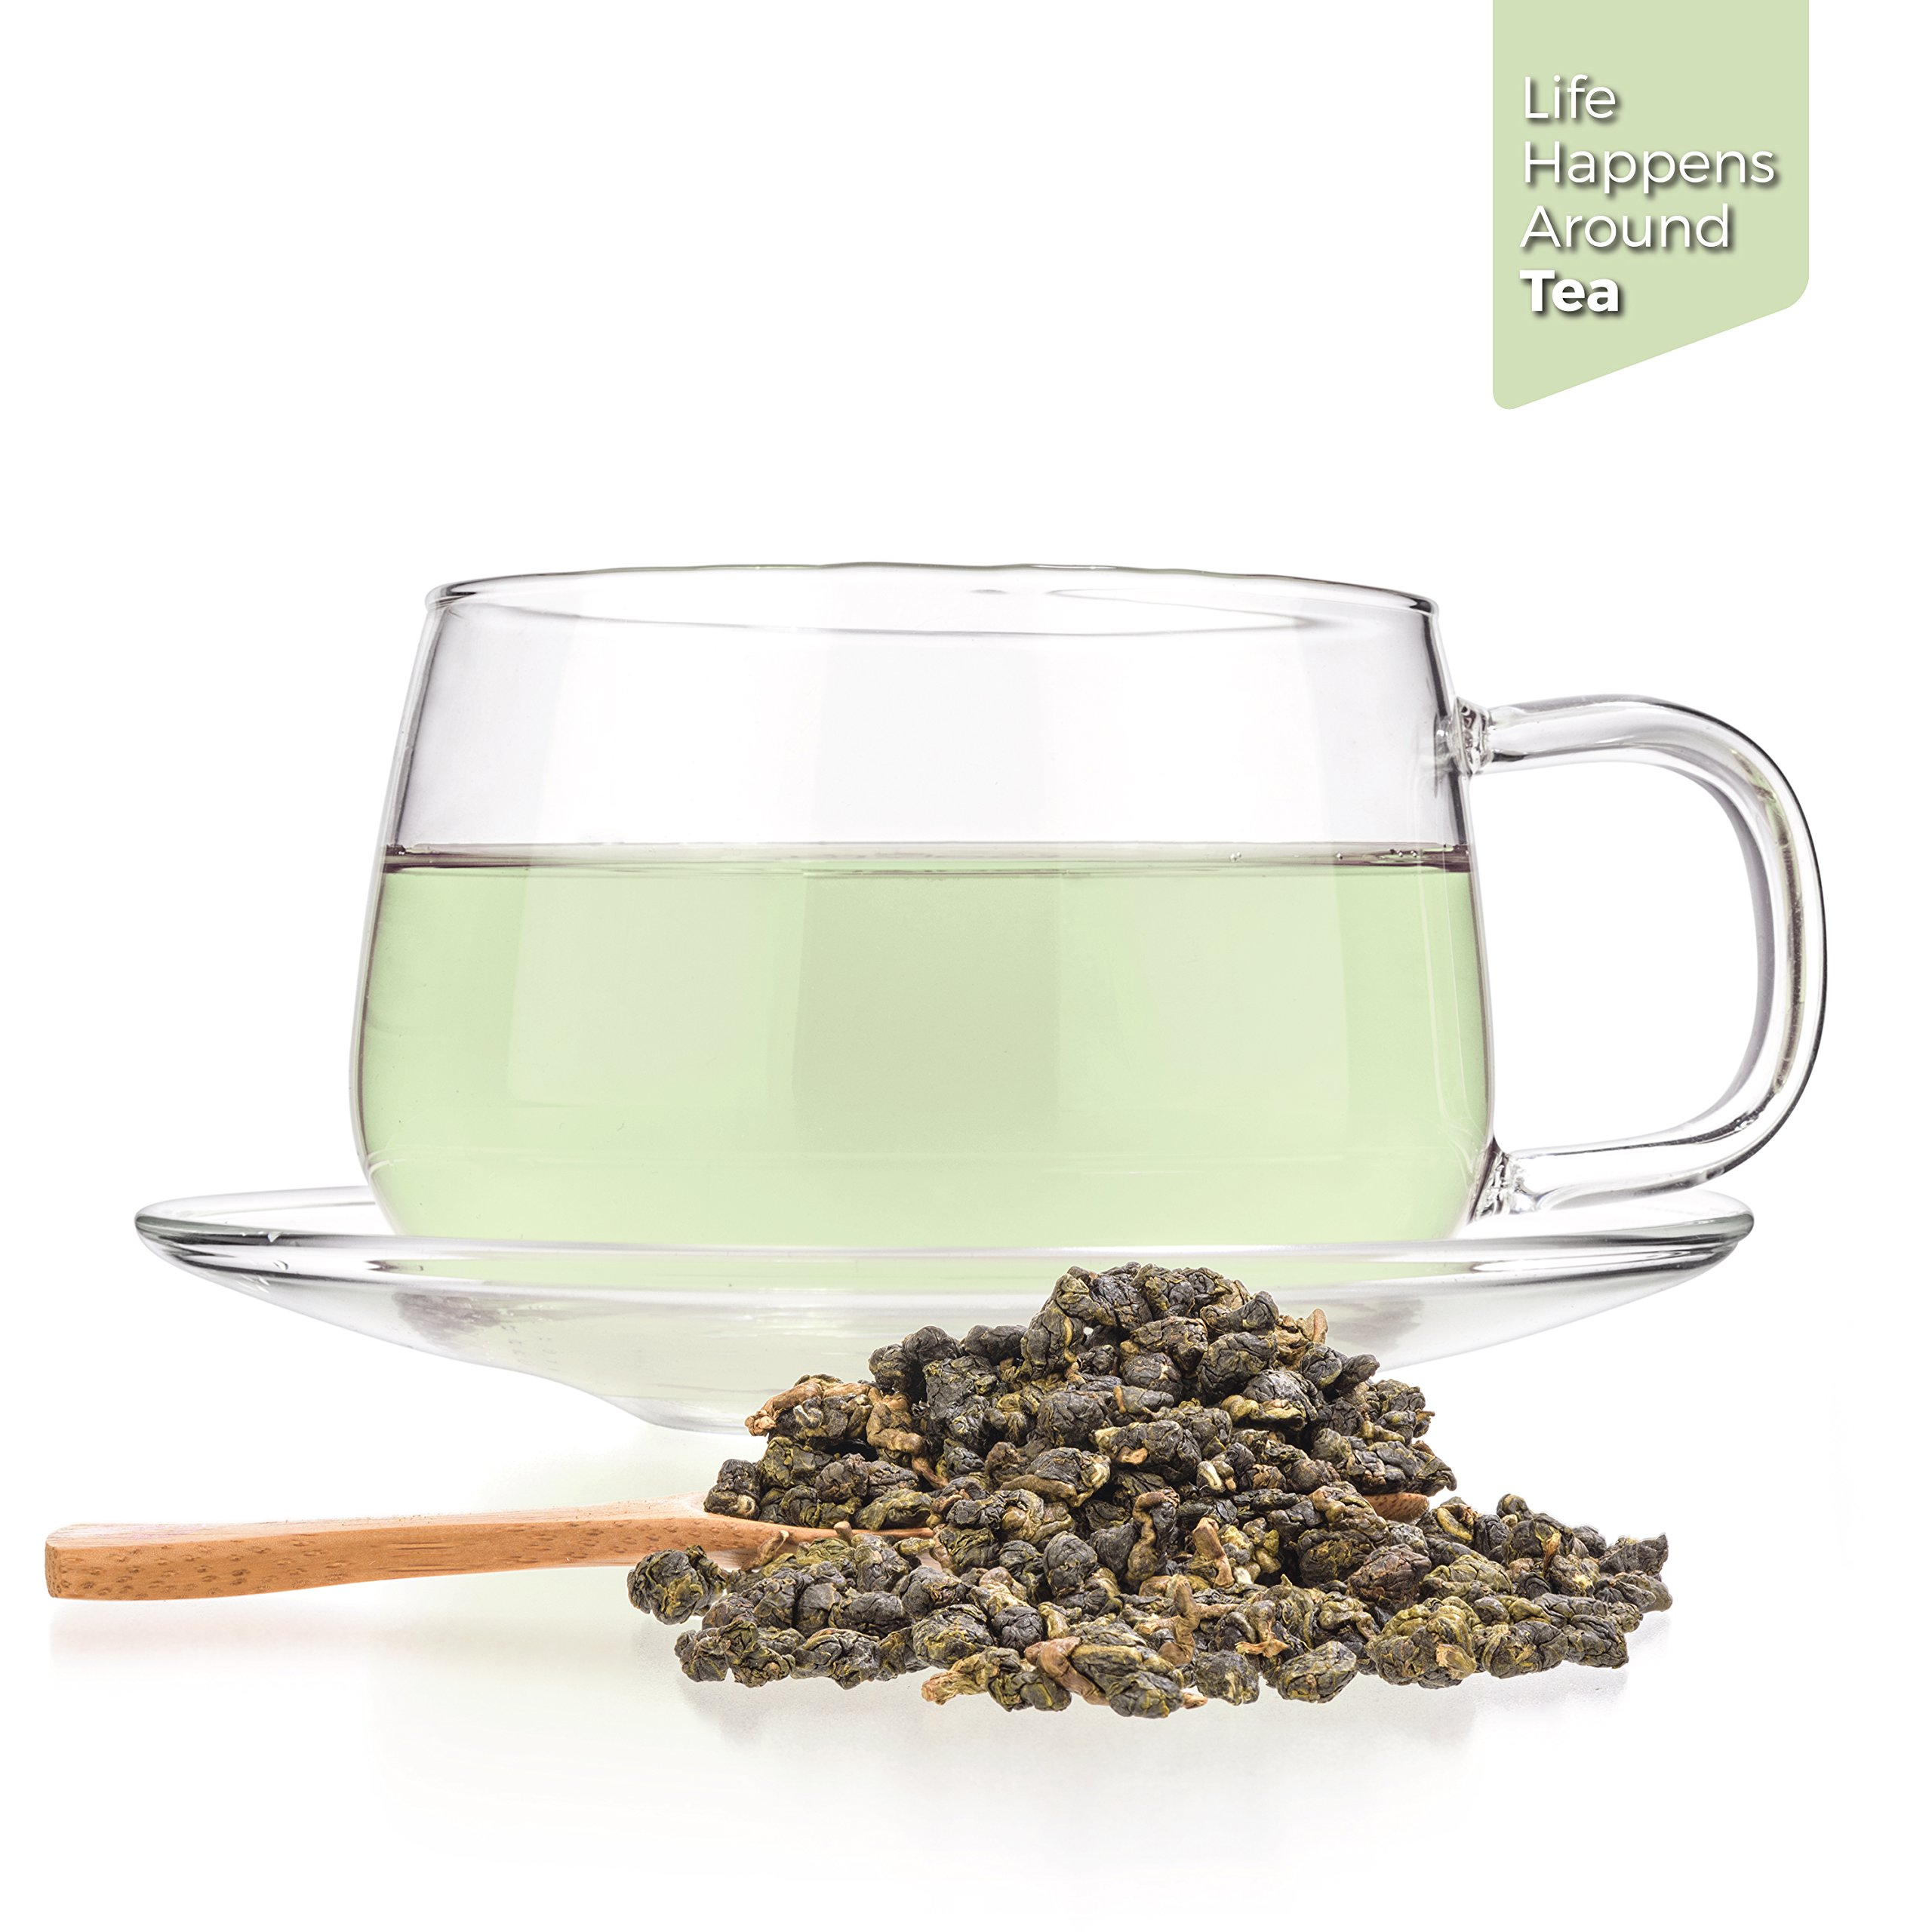 Tealyra - Milk Jin Xuan Oolong - High Mountain Taiwanese Loose Leaf Tea - Great Milky Cream Taste and Aroma - Organically Grown - Weight Loss Tea - 200g (7-ounce) by Tealyra (Image #3)